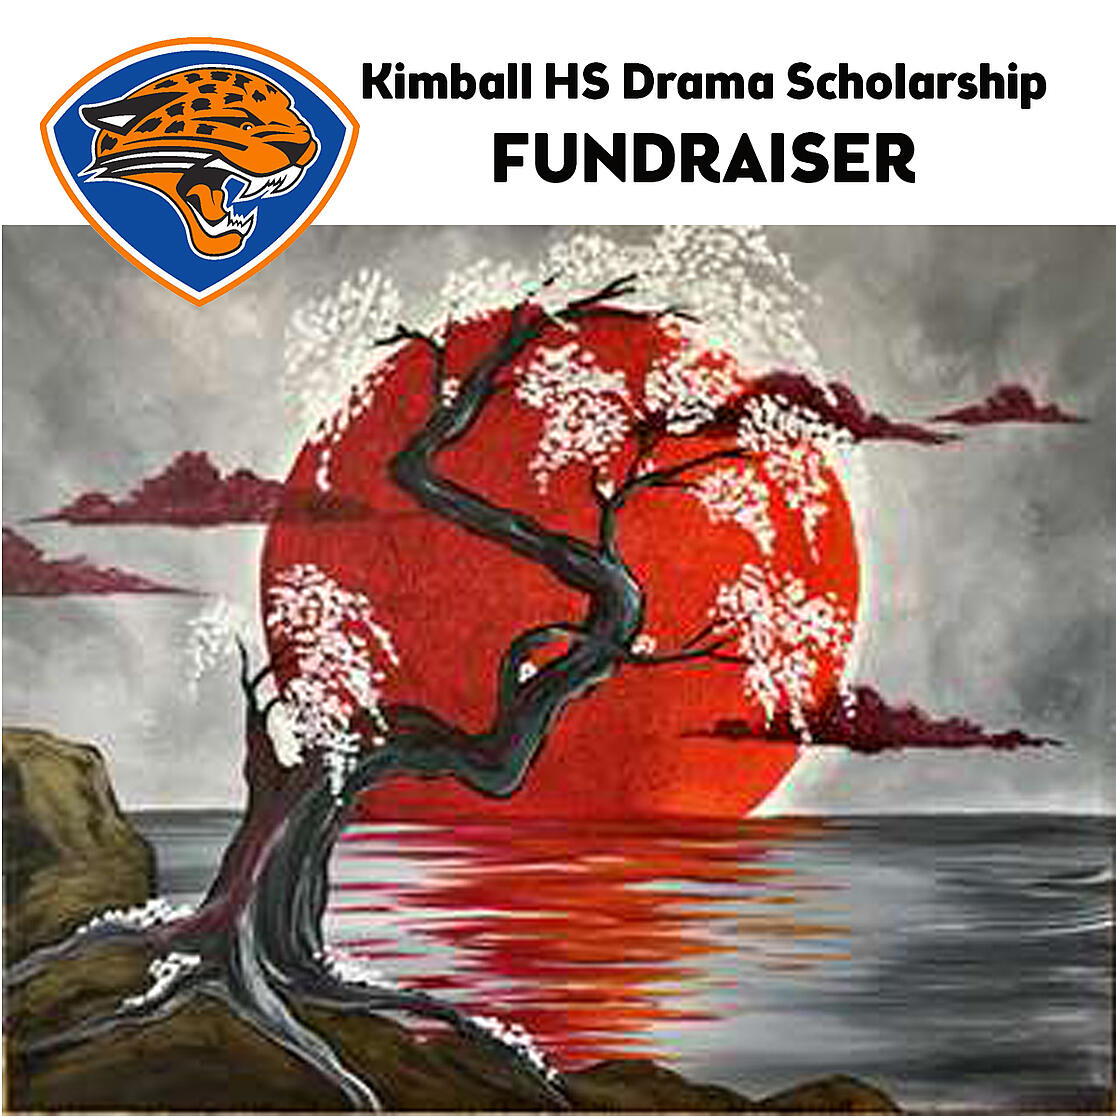 KHS drama fundraiser (2)-1